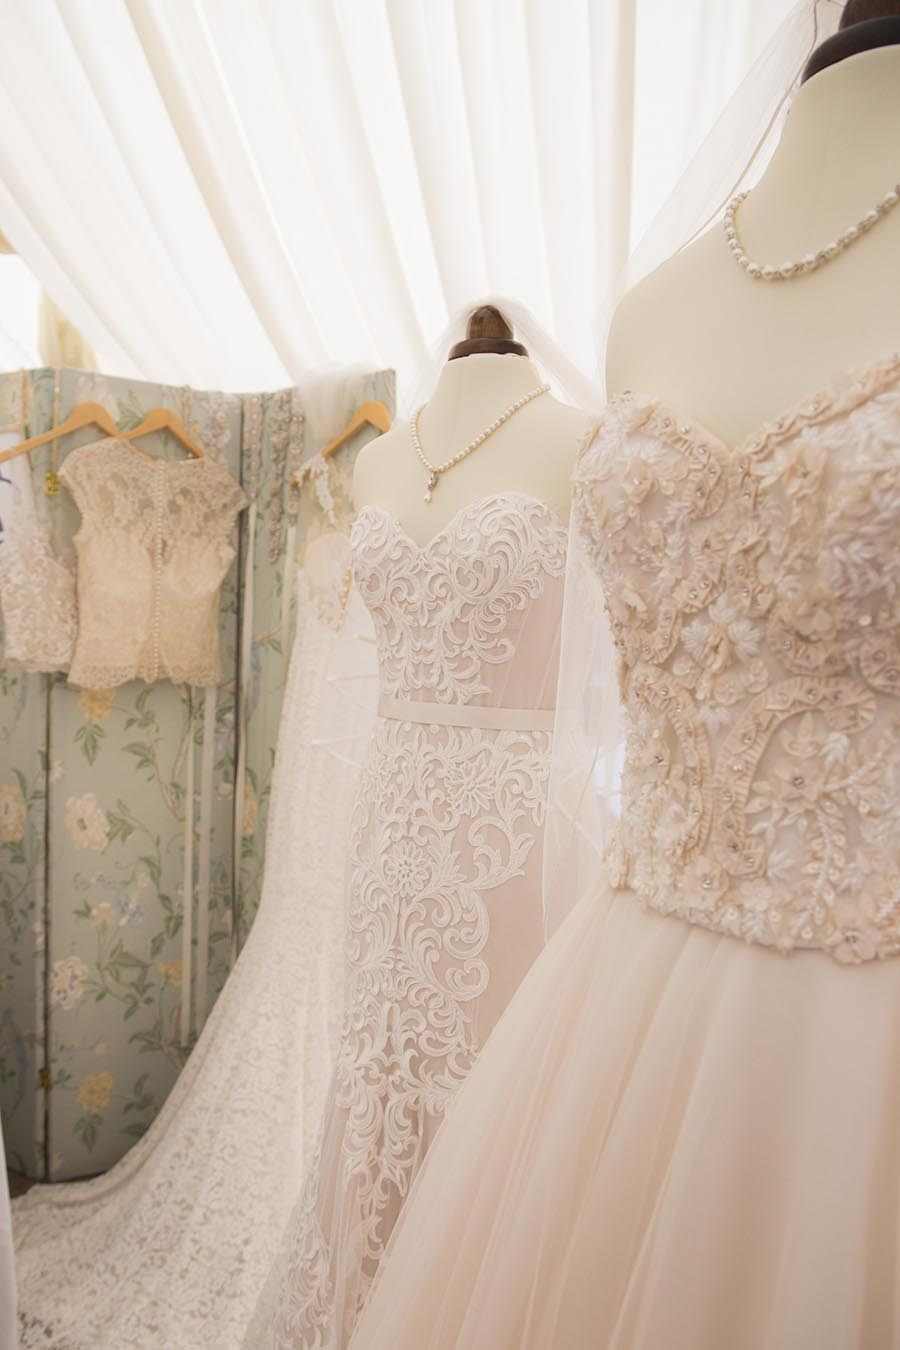 Shade Bridal, The Walled Garden Wedding Fair 2017, Sophie May Photo